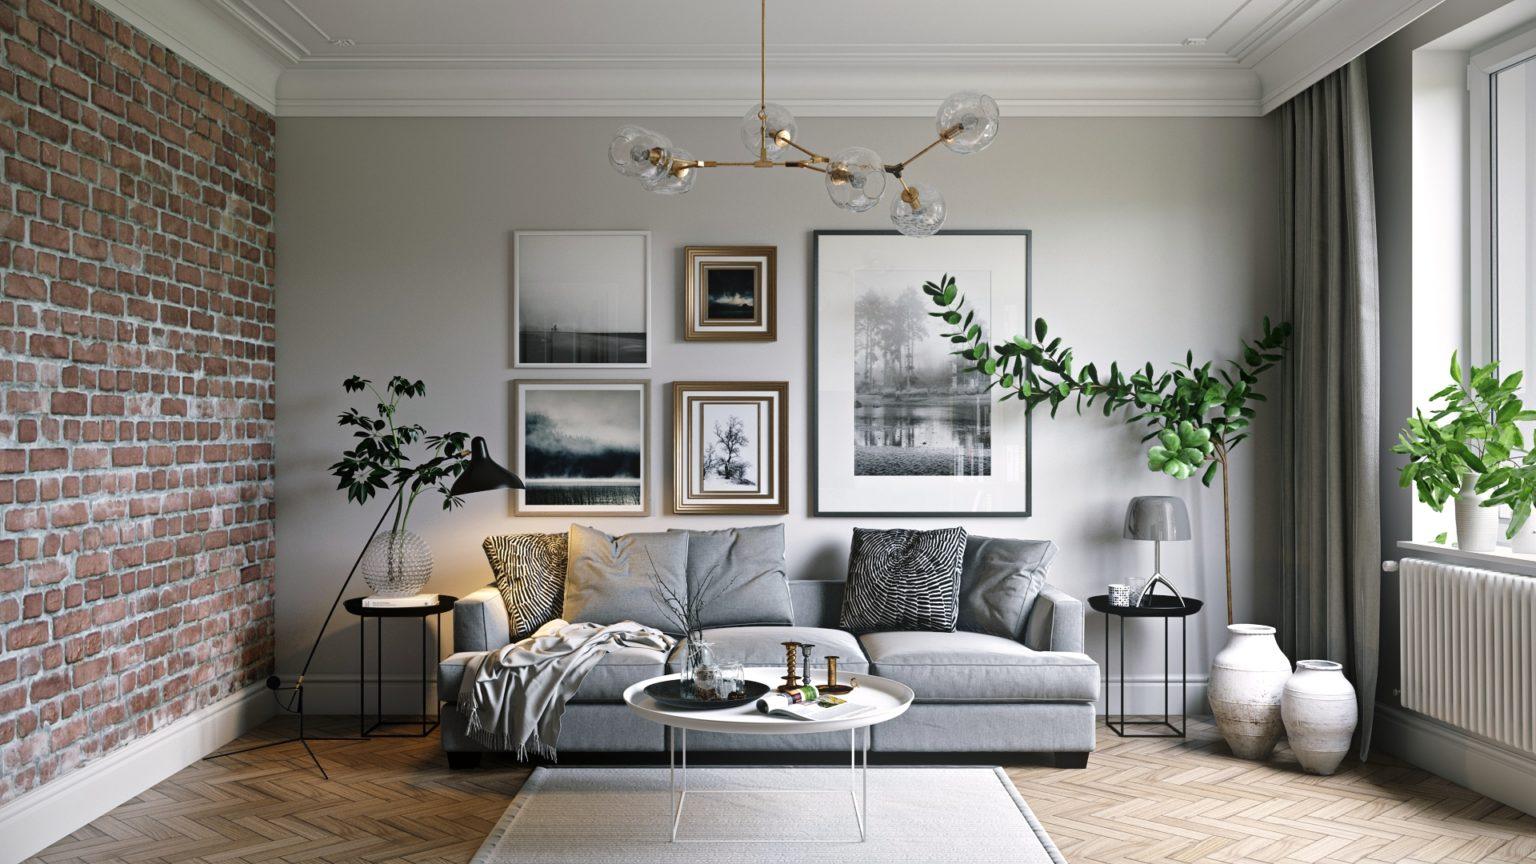 Дизайн жилой комнаты с белыми плинтусами